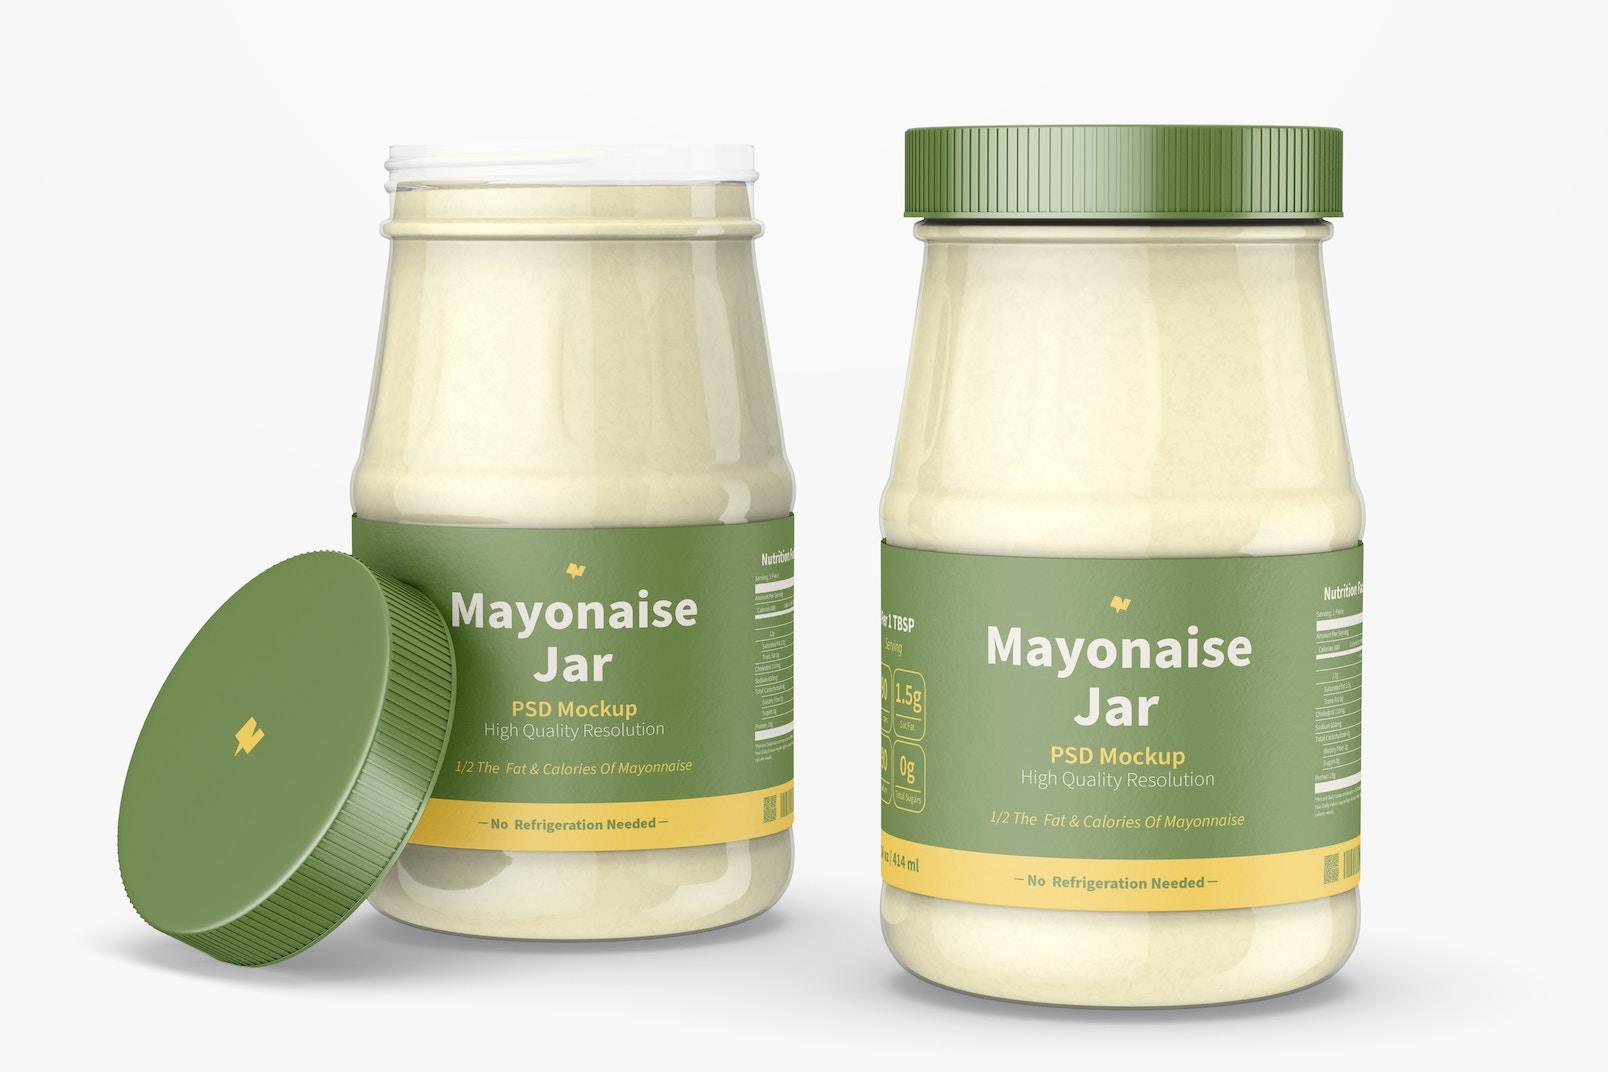 14 oz Mayonnaise Jars Mockup, Opened and Closed